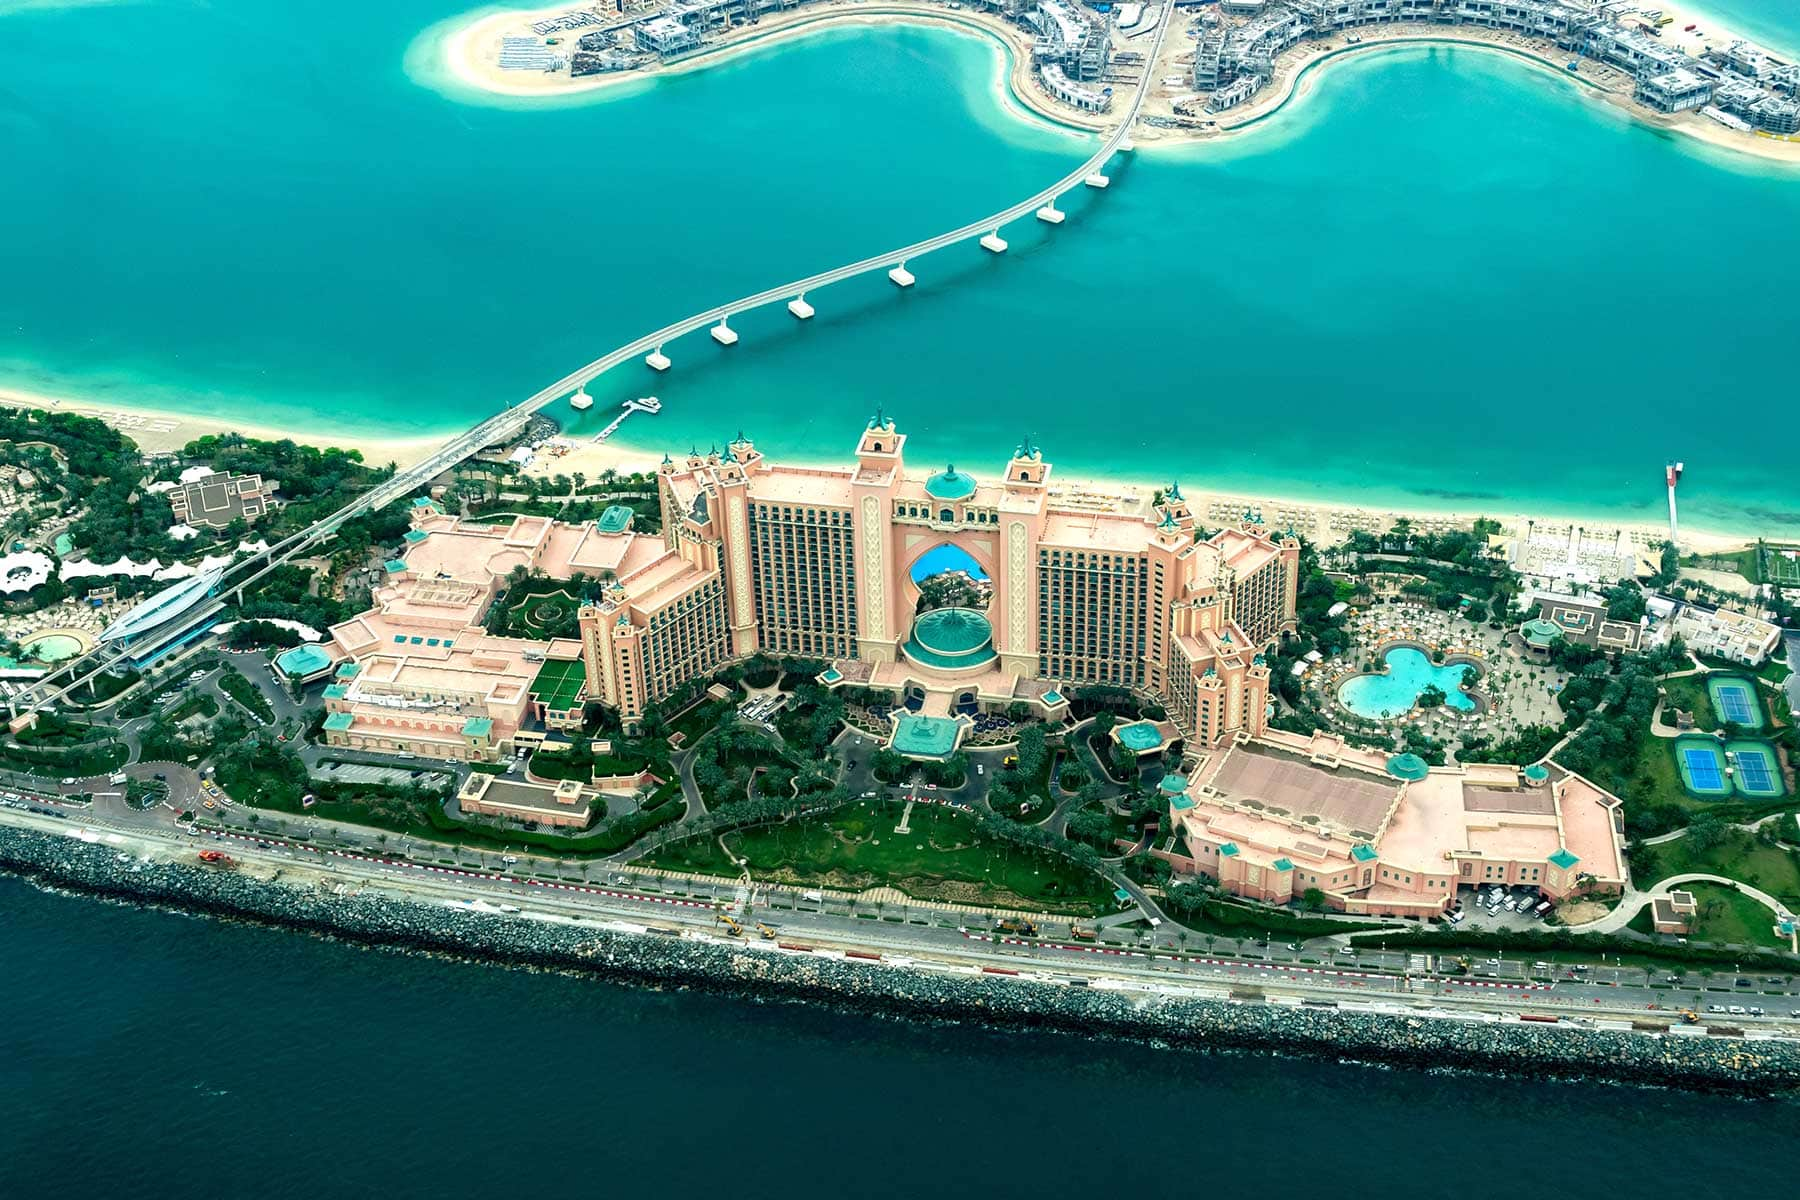 Resor-till-Dubai-med-Nygren-&-Lind-Resebyrå--atlantis